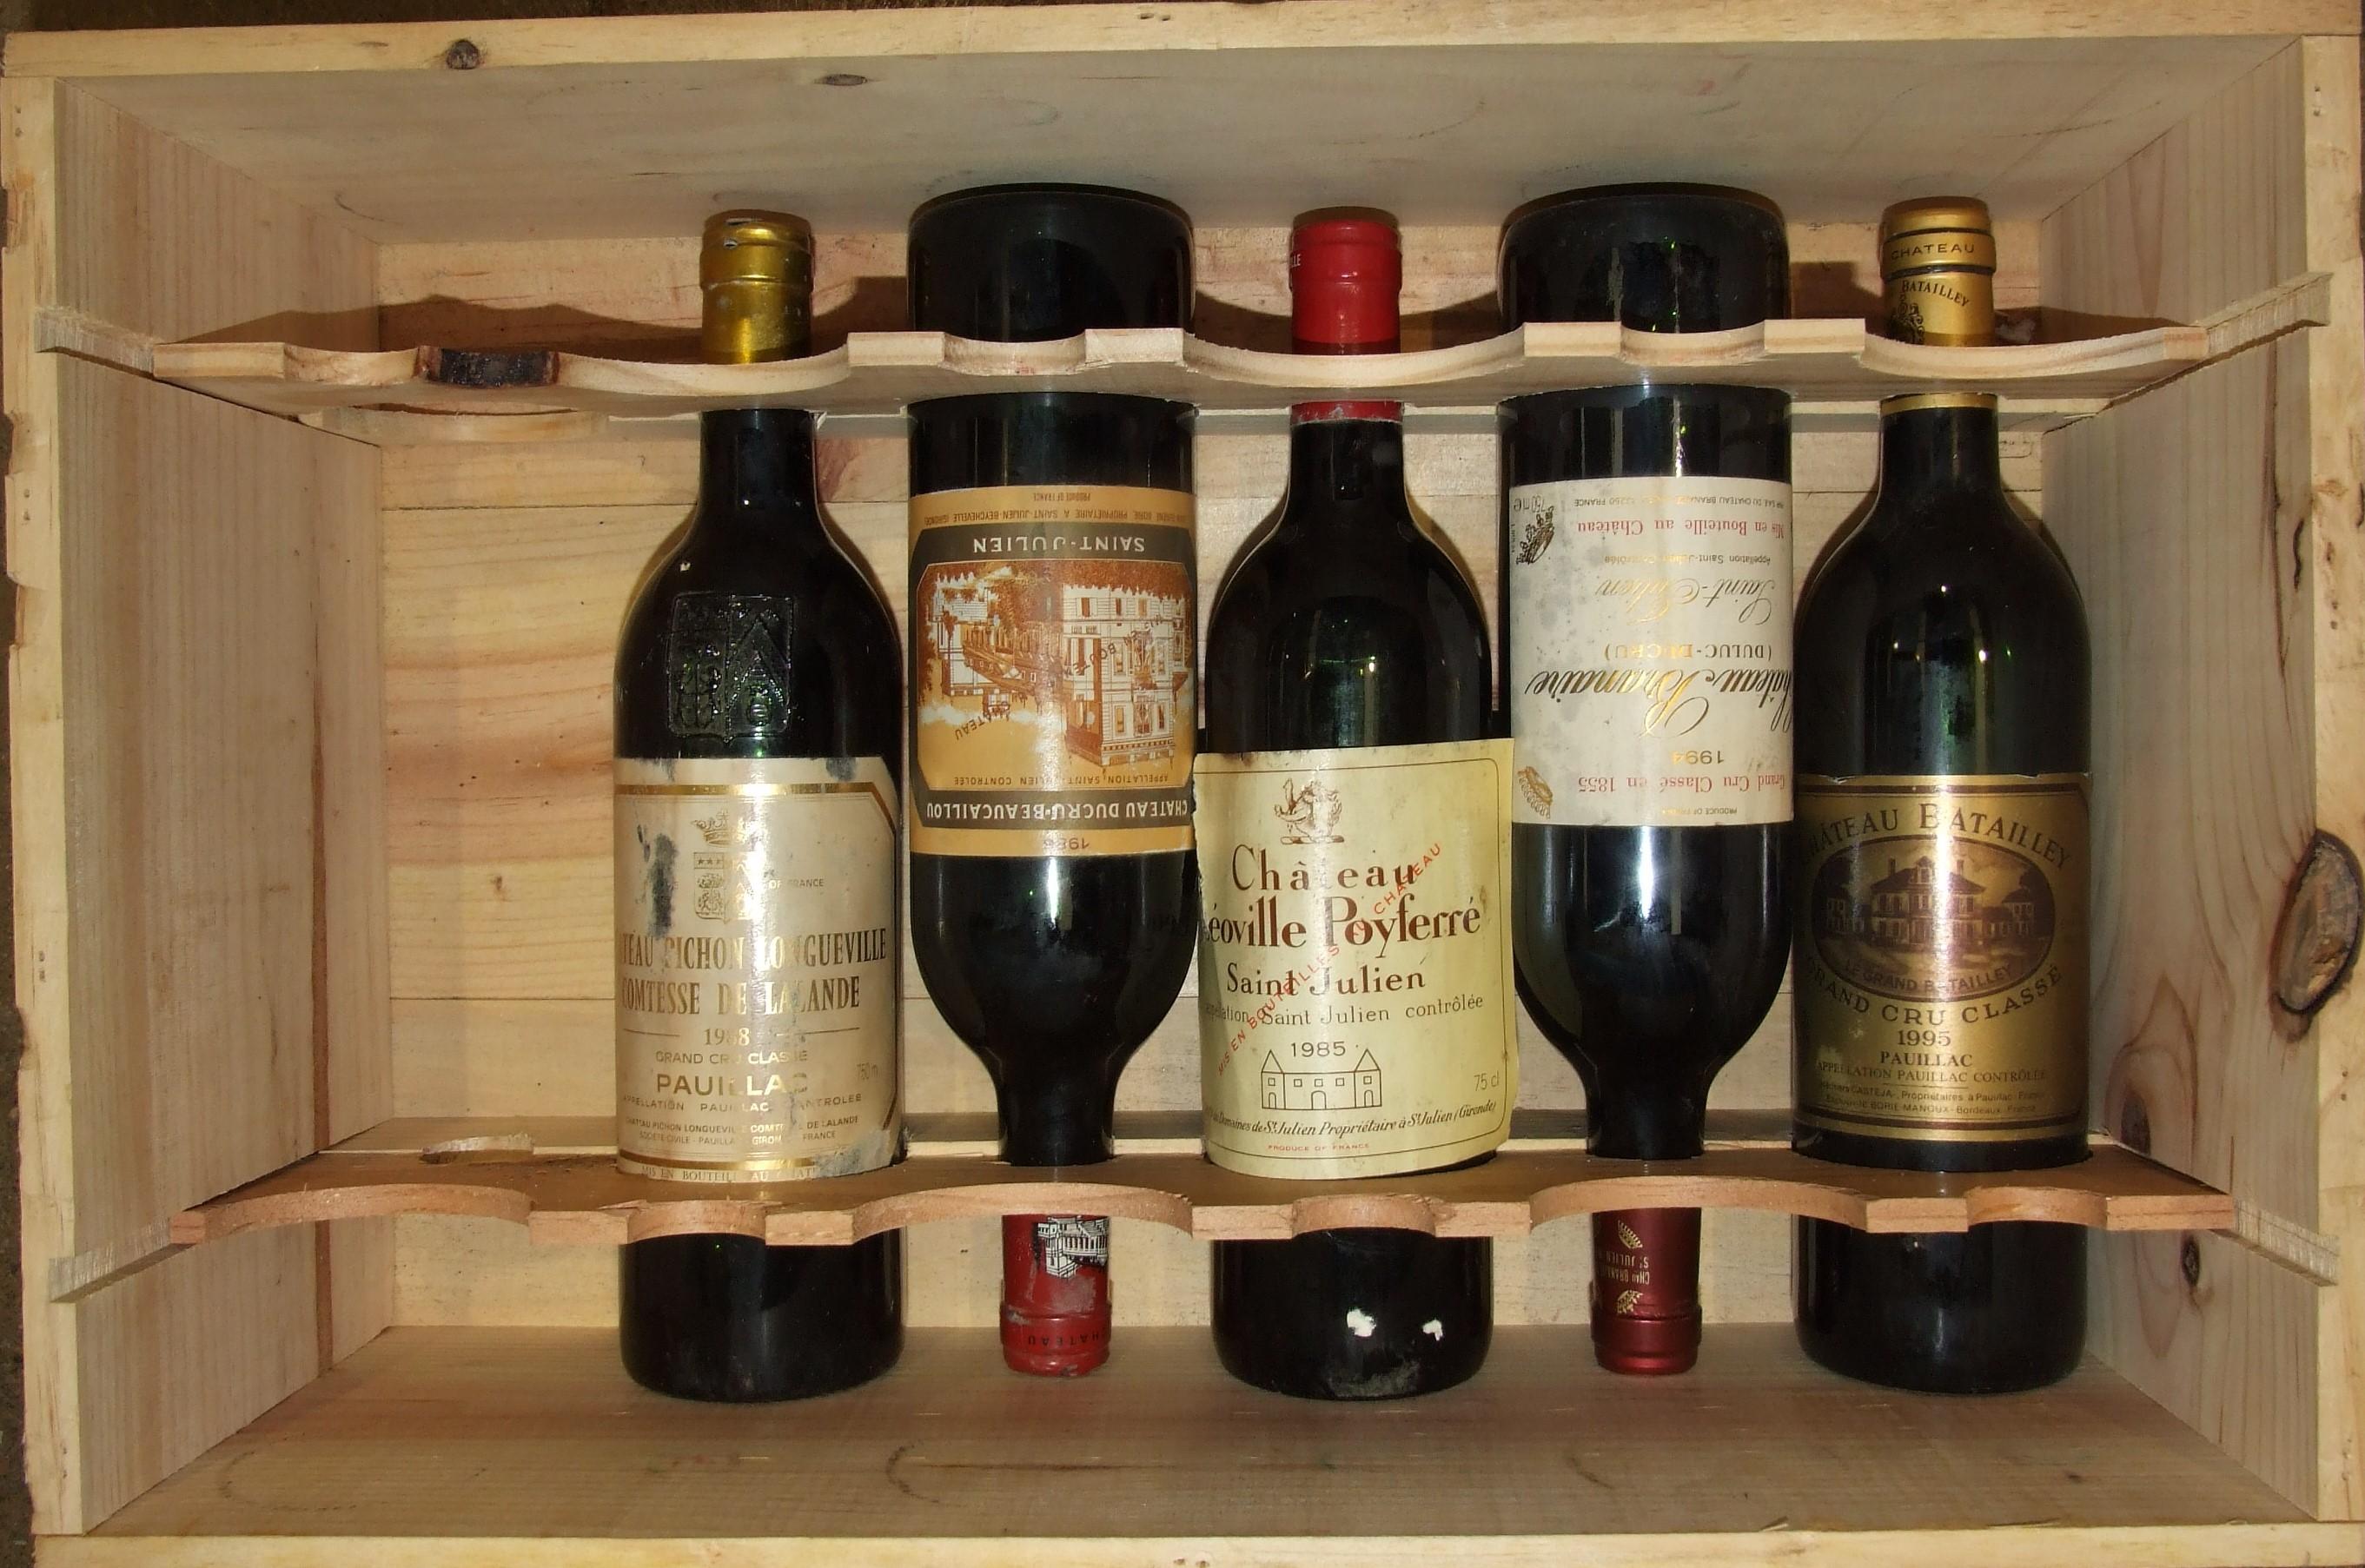 Lot 19 - Chateau Batailley 1995, one bottle, Chateau Branaire Ducru 1994, one bottle, Chateau Pichon